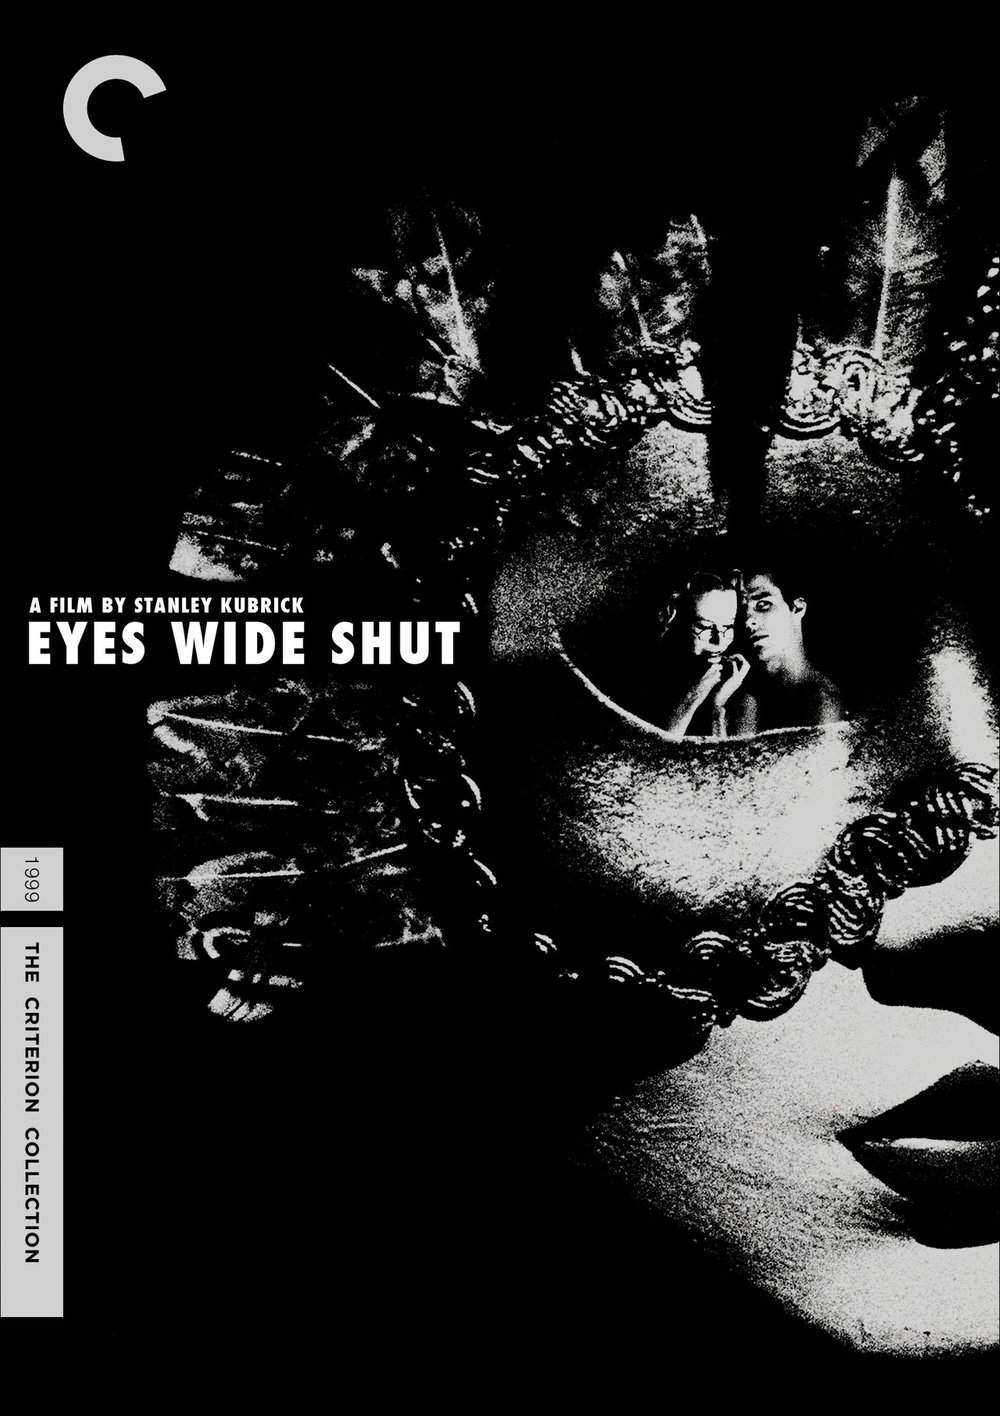 Eyes_Wide_Shut_(1999).jpg